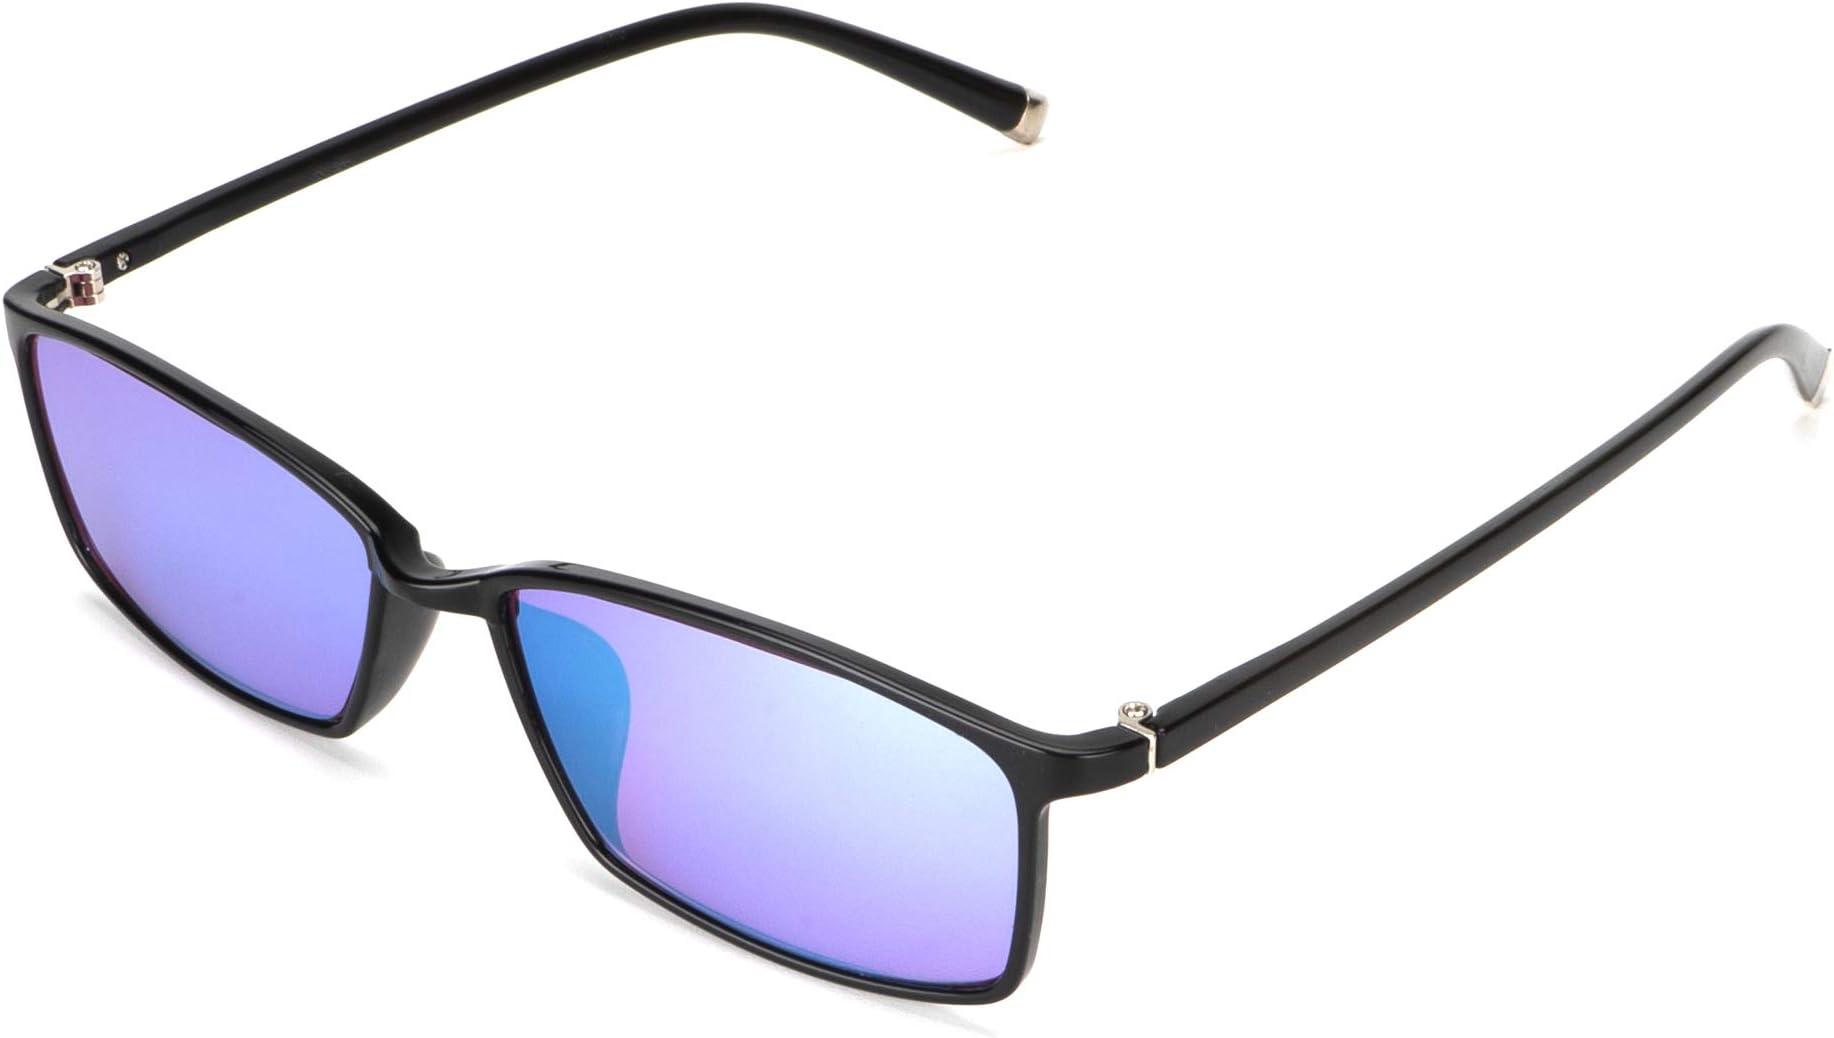 STBJ Red/Green Uni-sex Color Blind Glasses w/Purple Blue Lenses